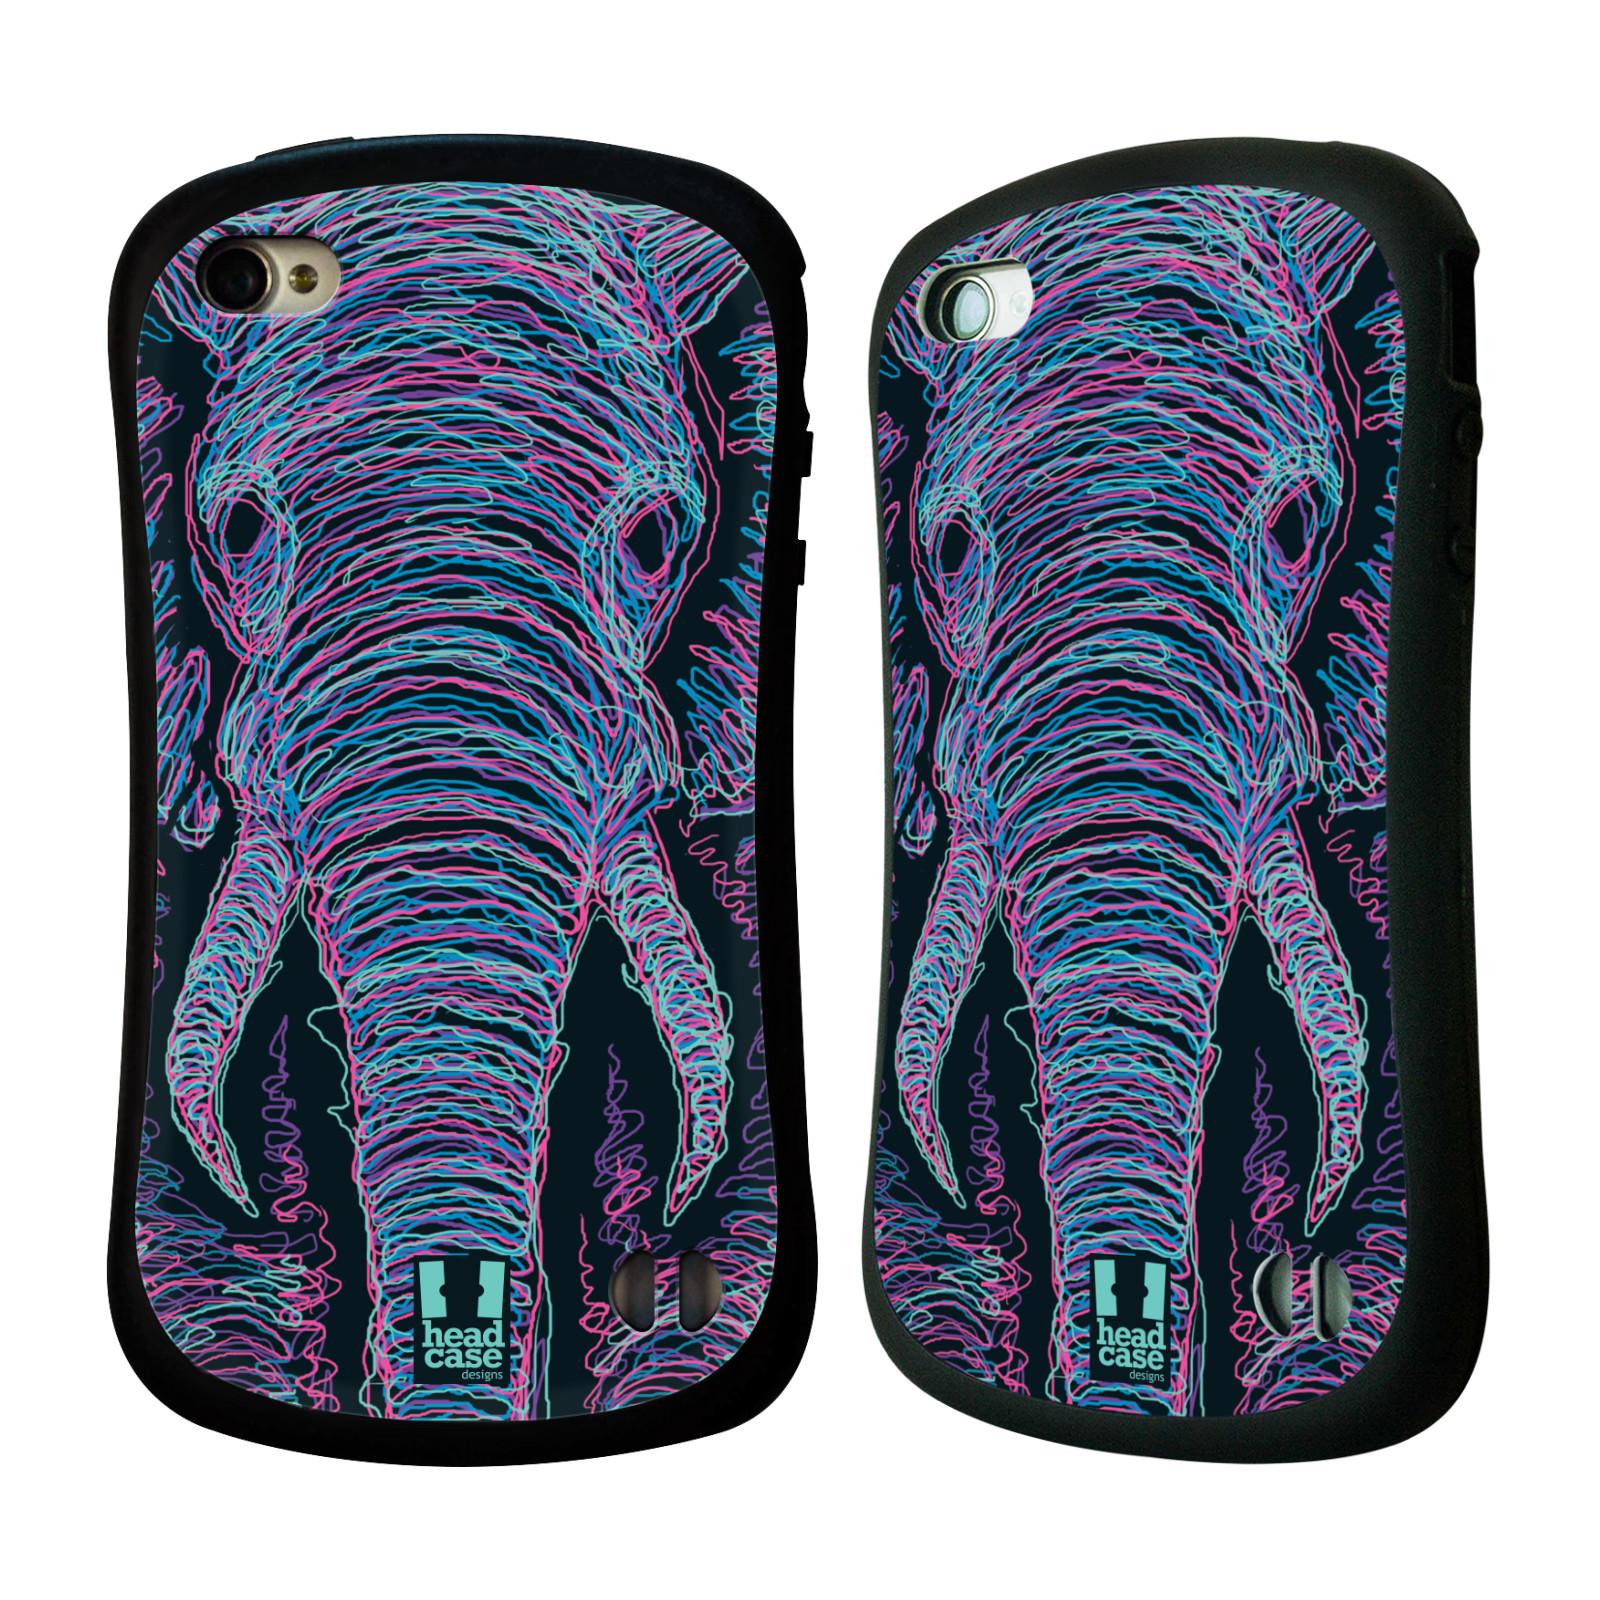 HEAD CASE silikon/plast odolný obal na mobil Apple Iphone 4/4S vzor zvíře čmáranice slon